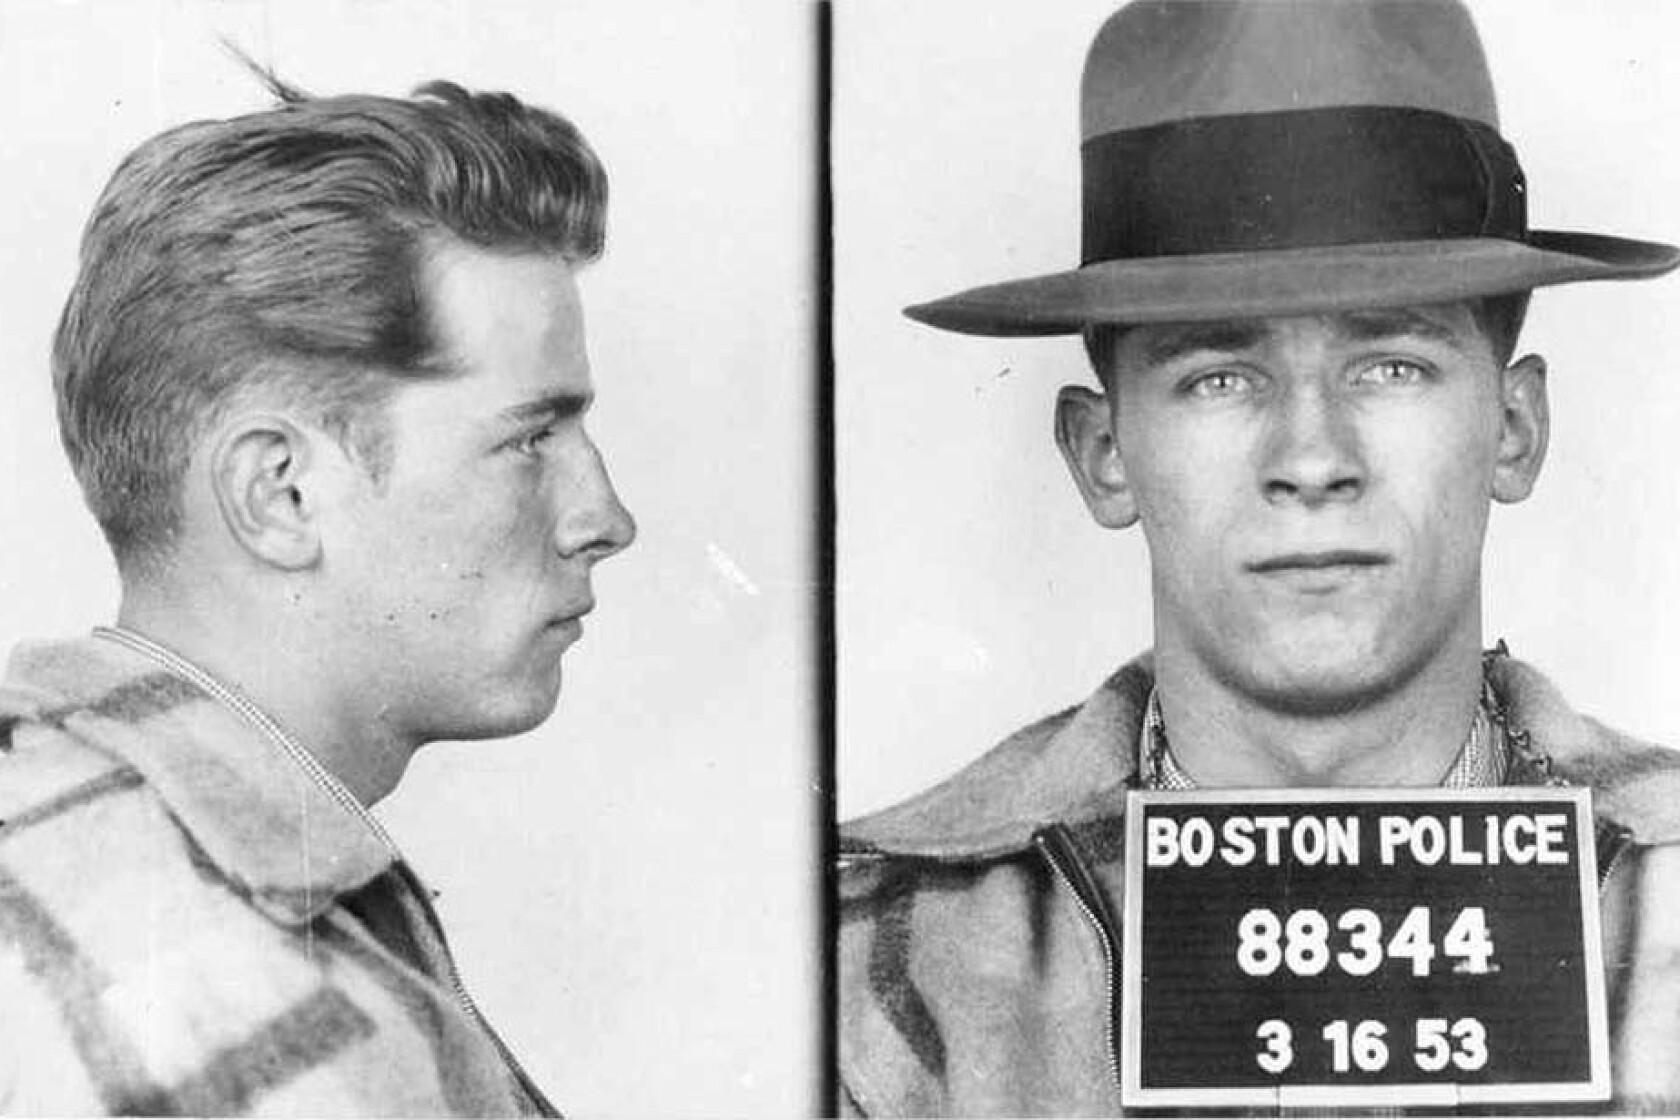 Whitey' Bulger, notorious Boston mobster-turned-fugitive